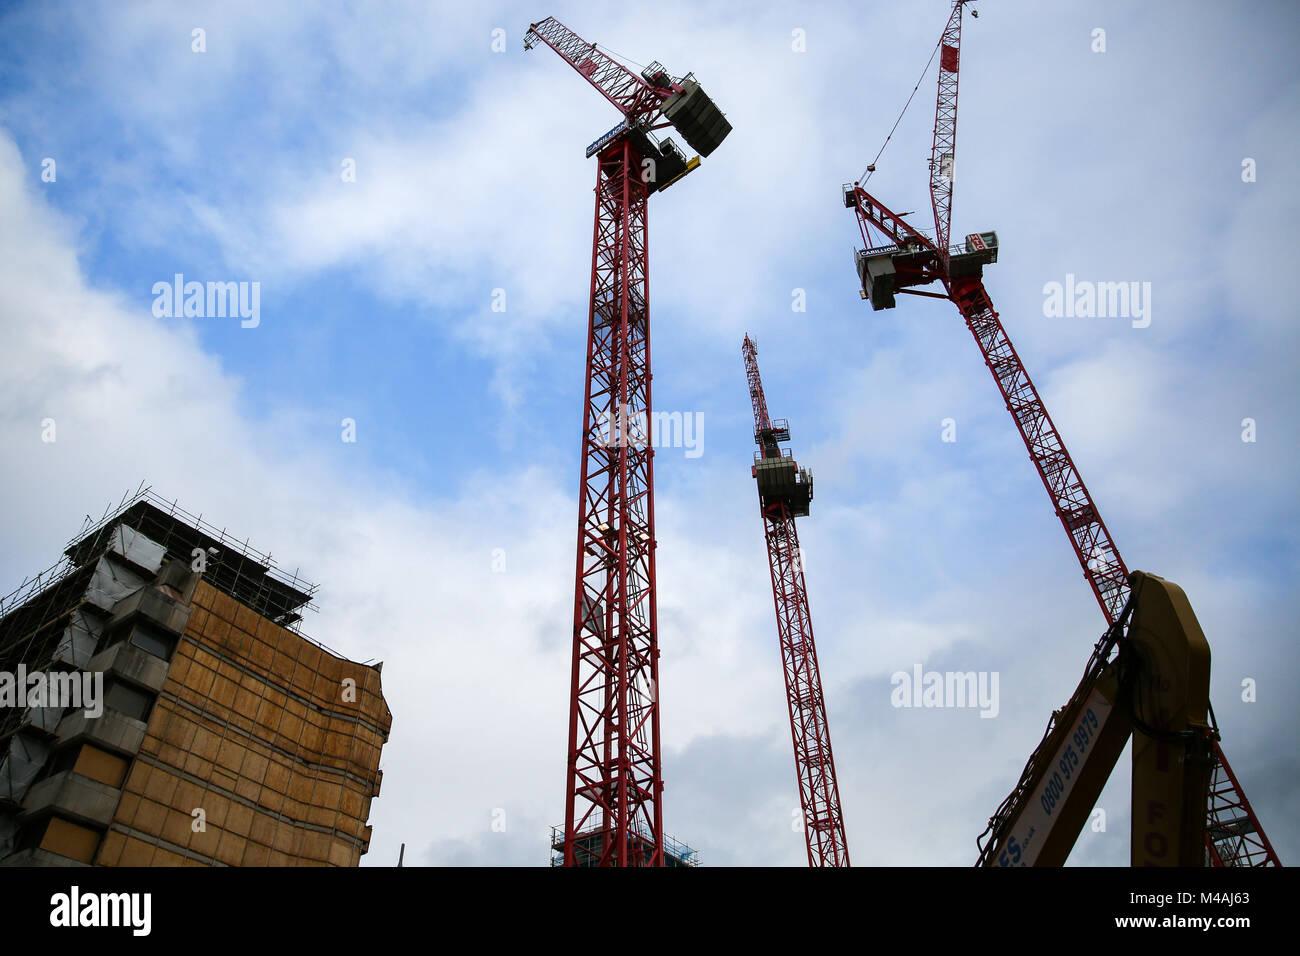 Cranes with the Carillion construction company logo hang